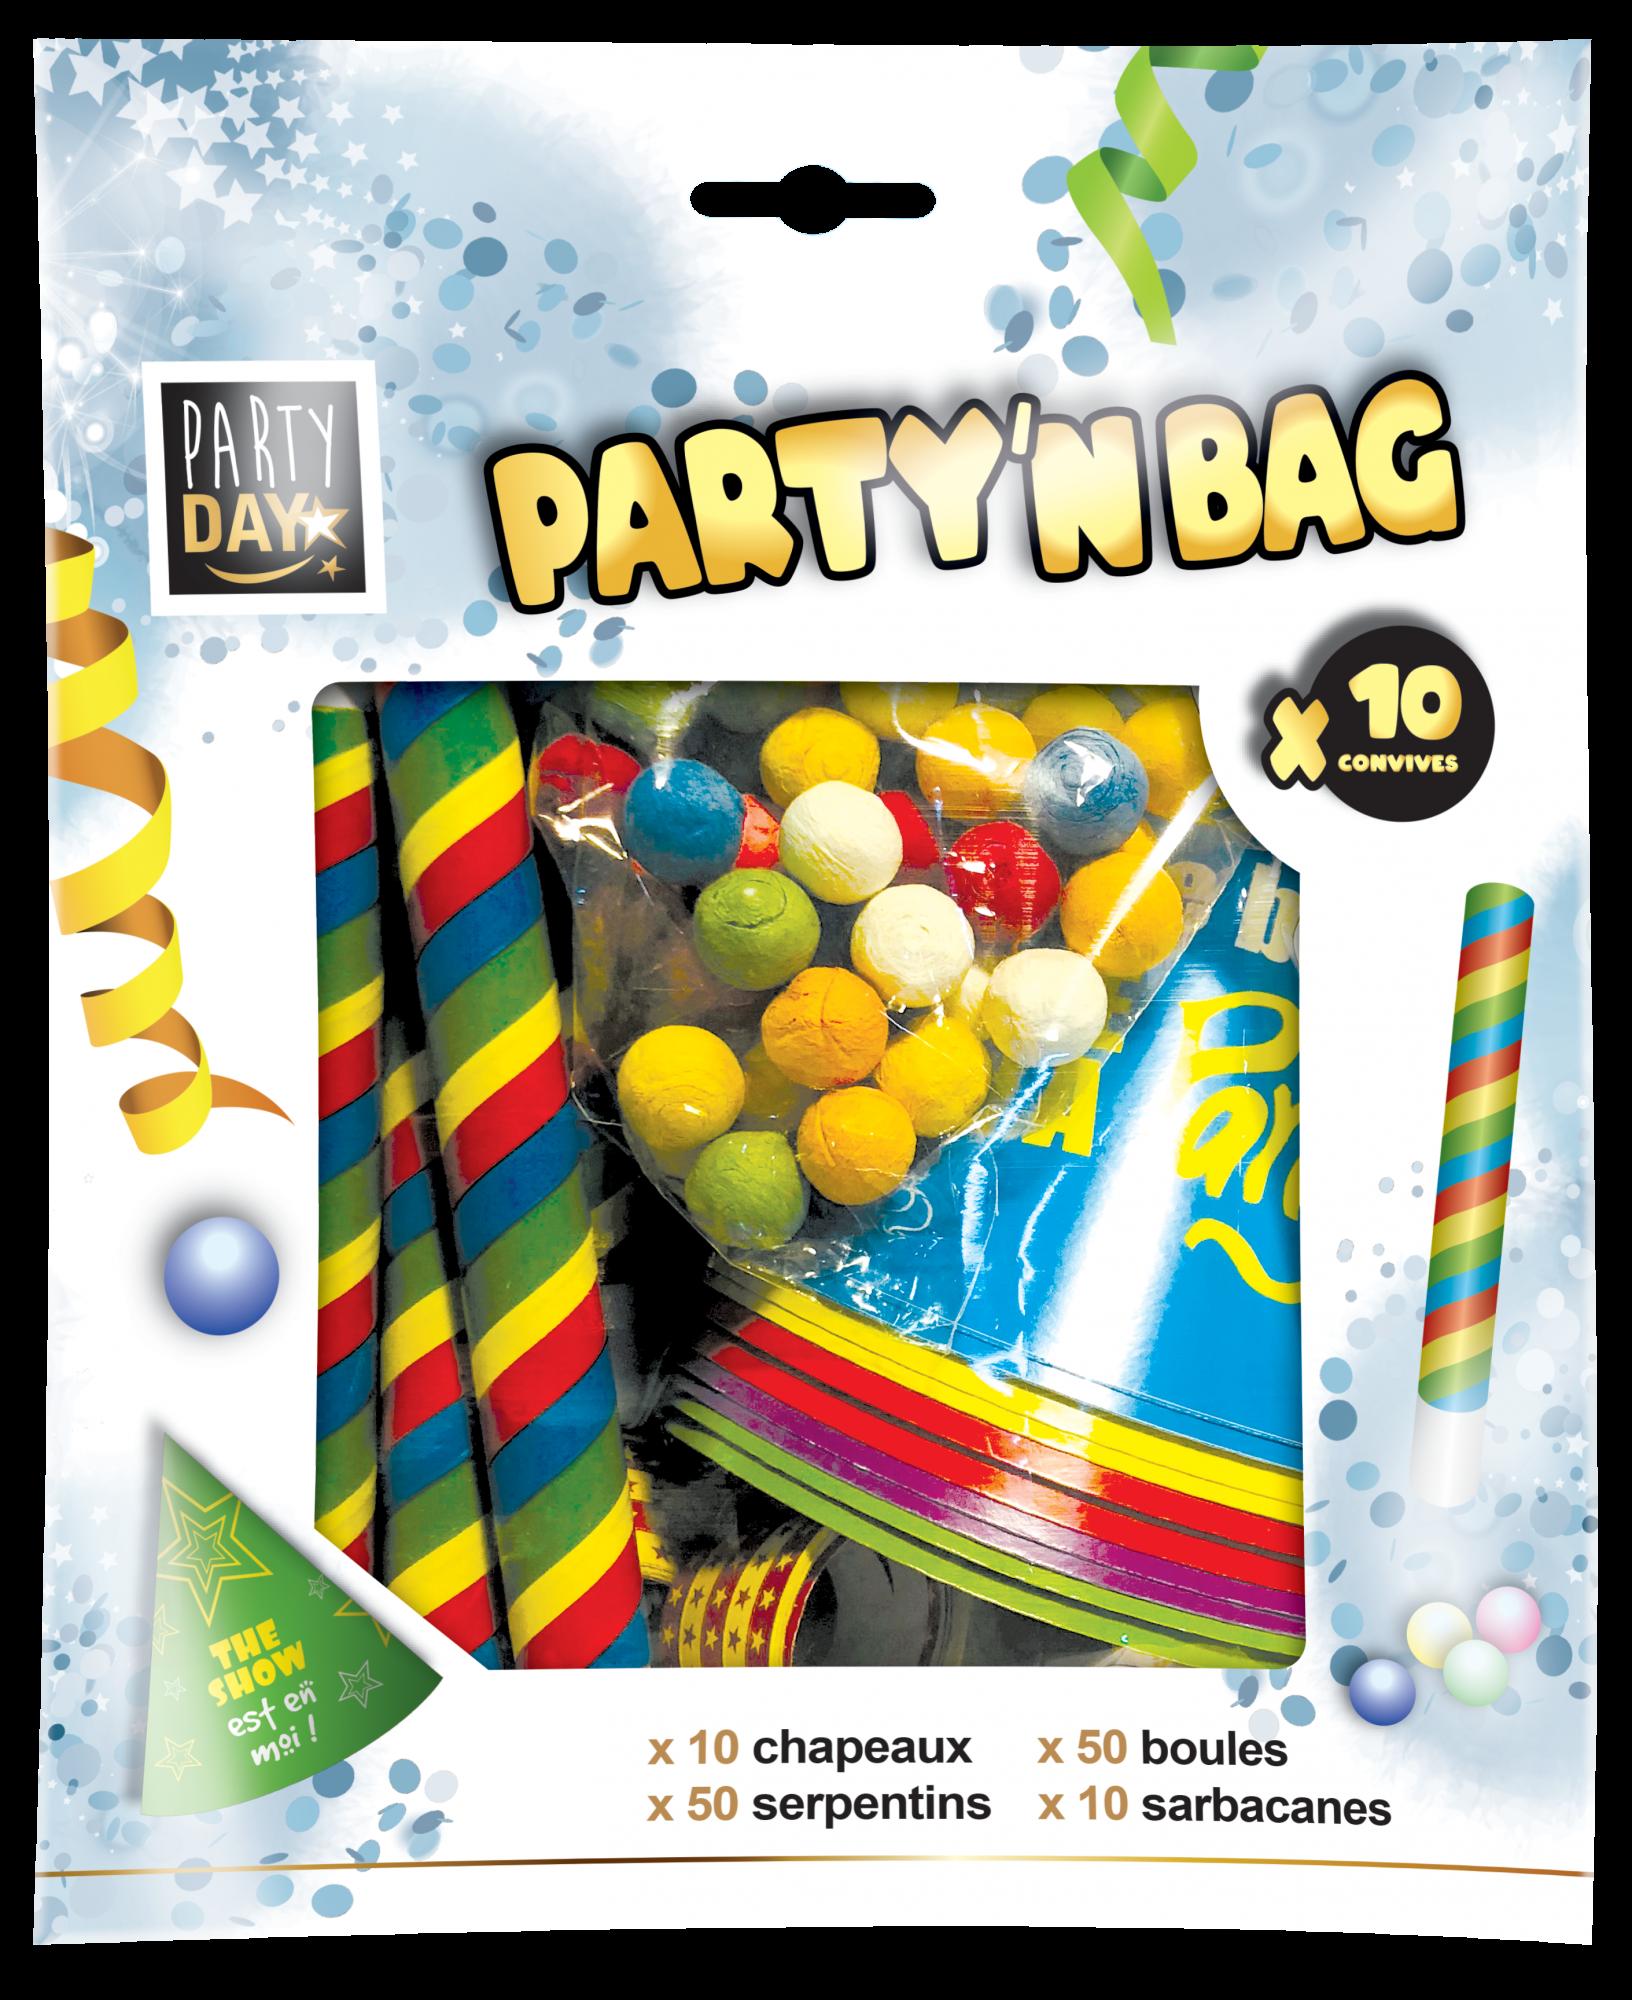 P162109-PARTYNBAG-3D